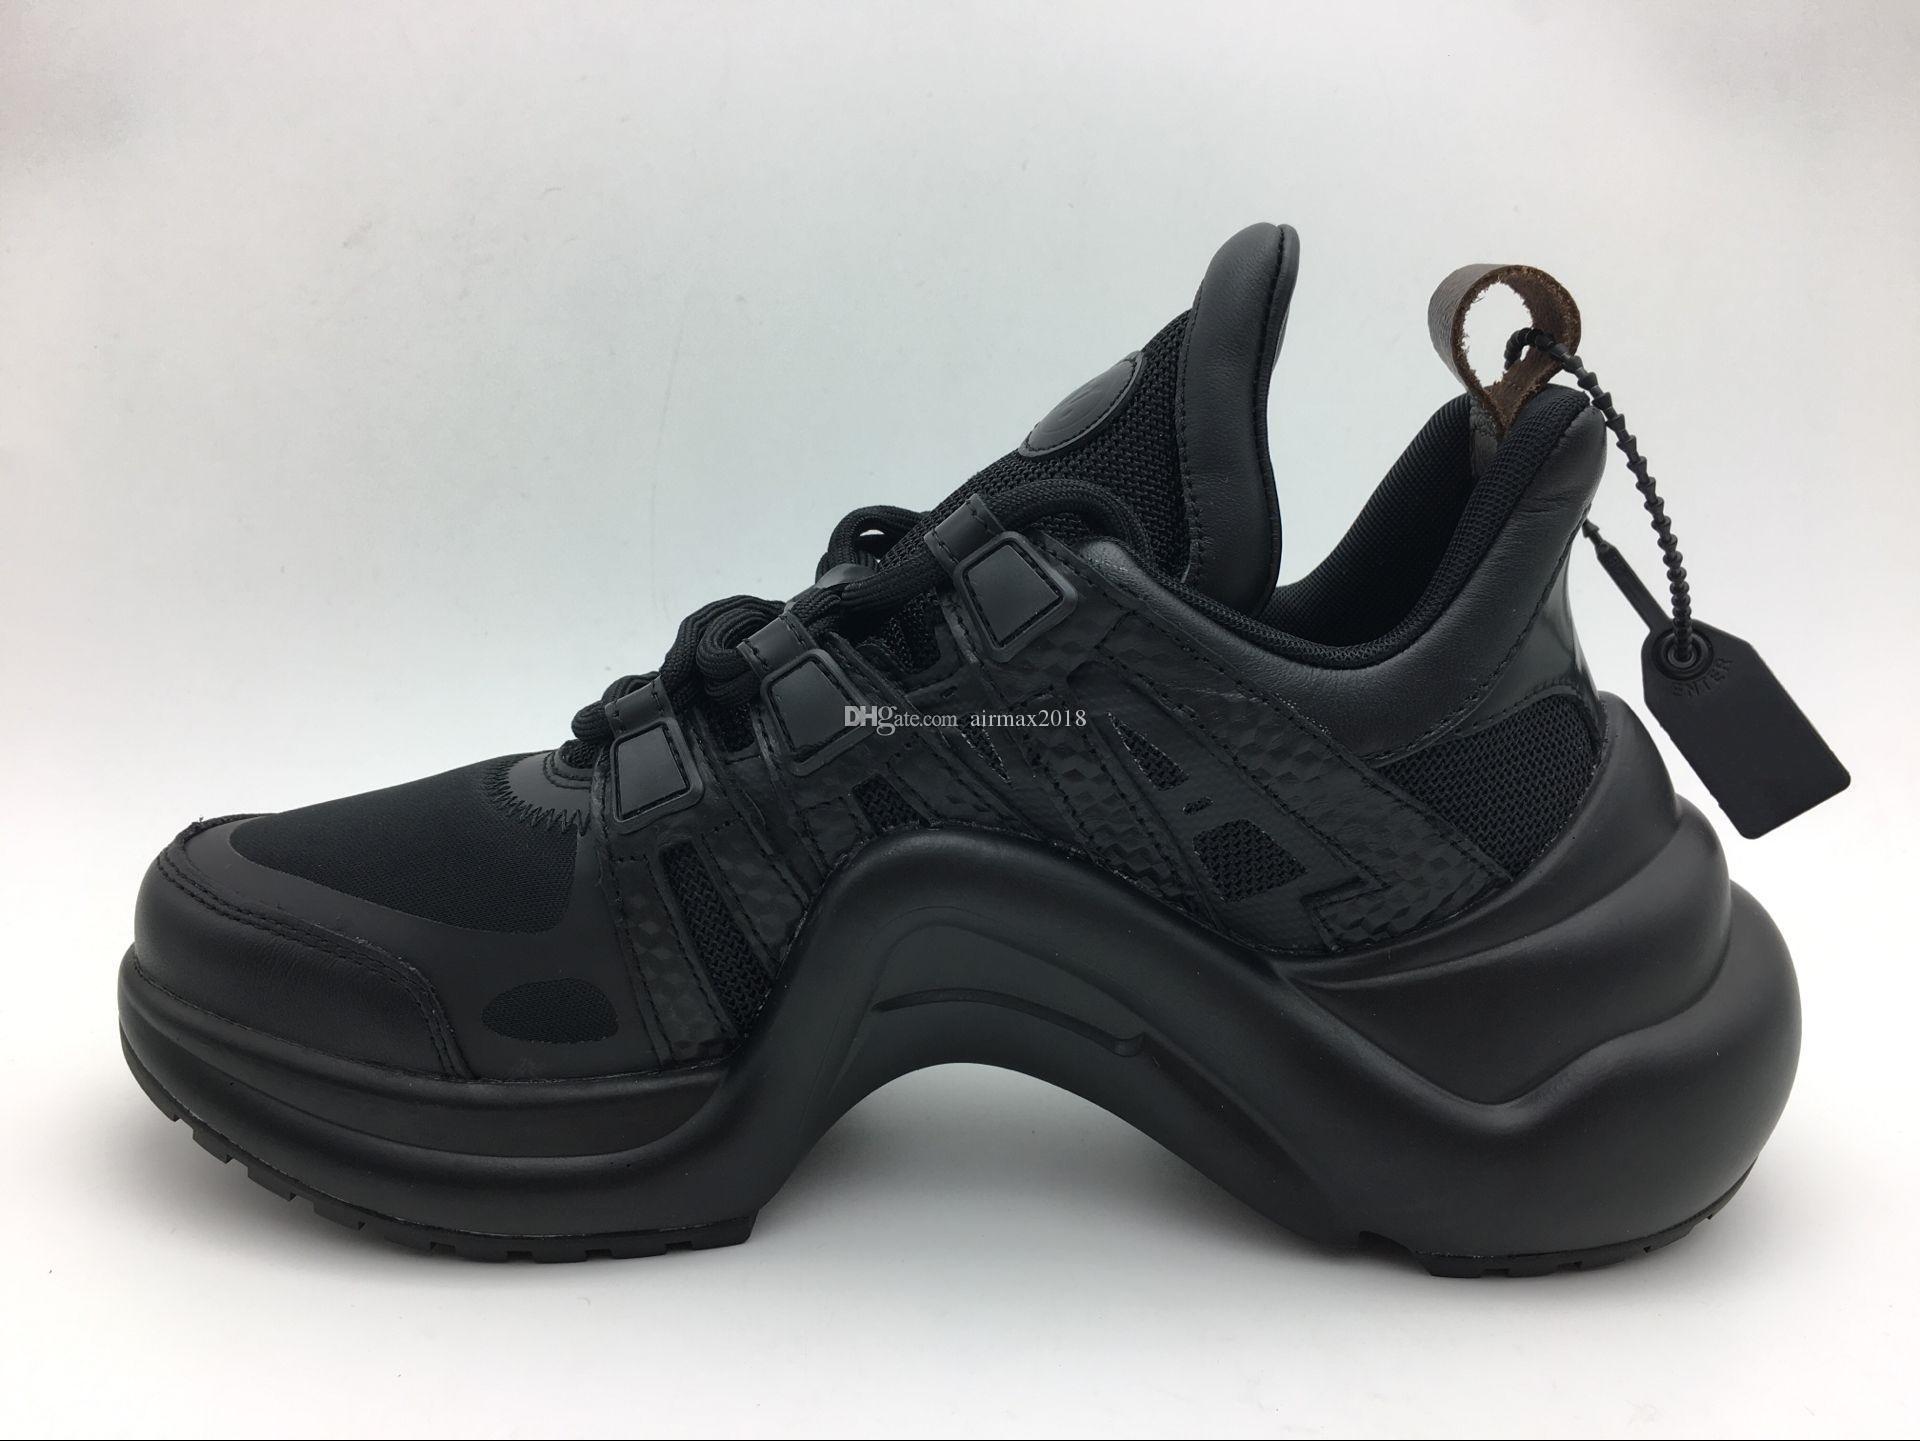 0969edbf130c21 2018 New Luxury Archlight Sneaker Men And Women Genuine Leather ...